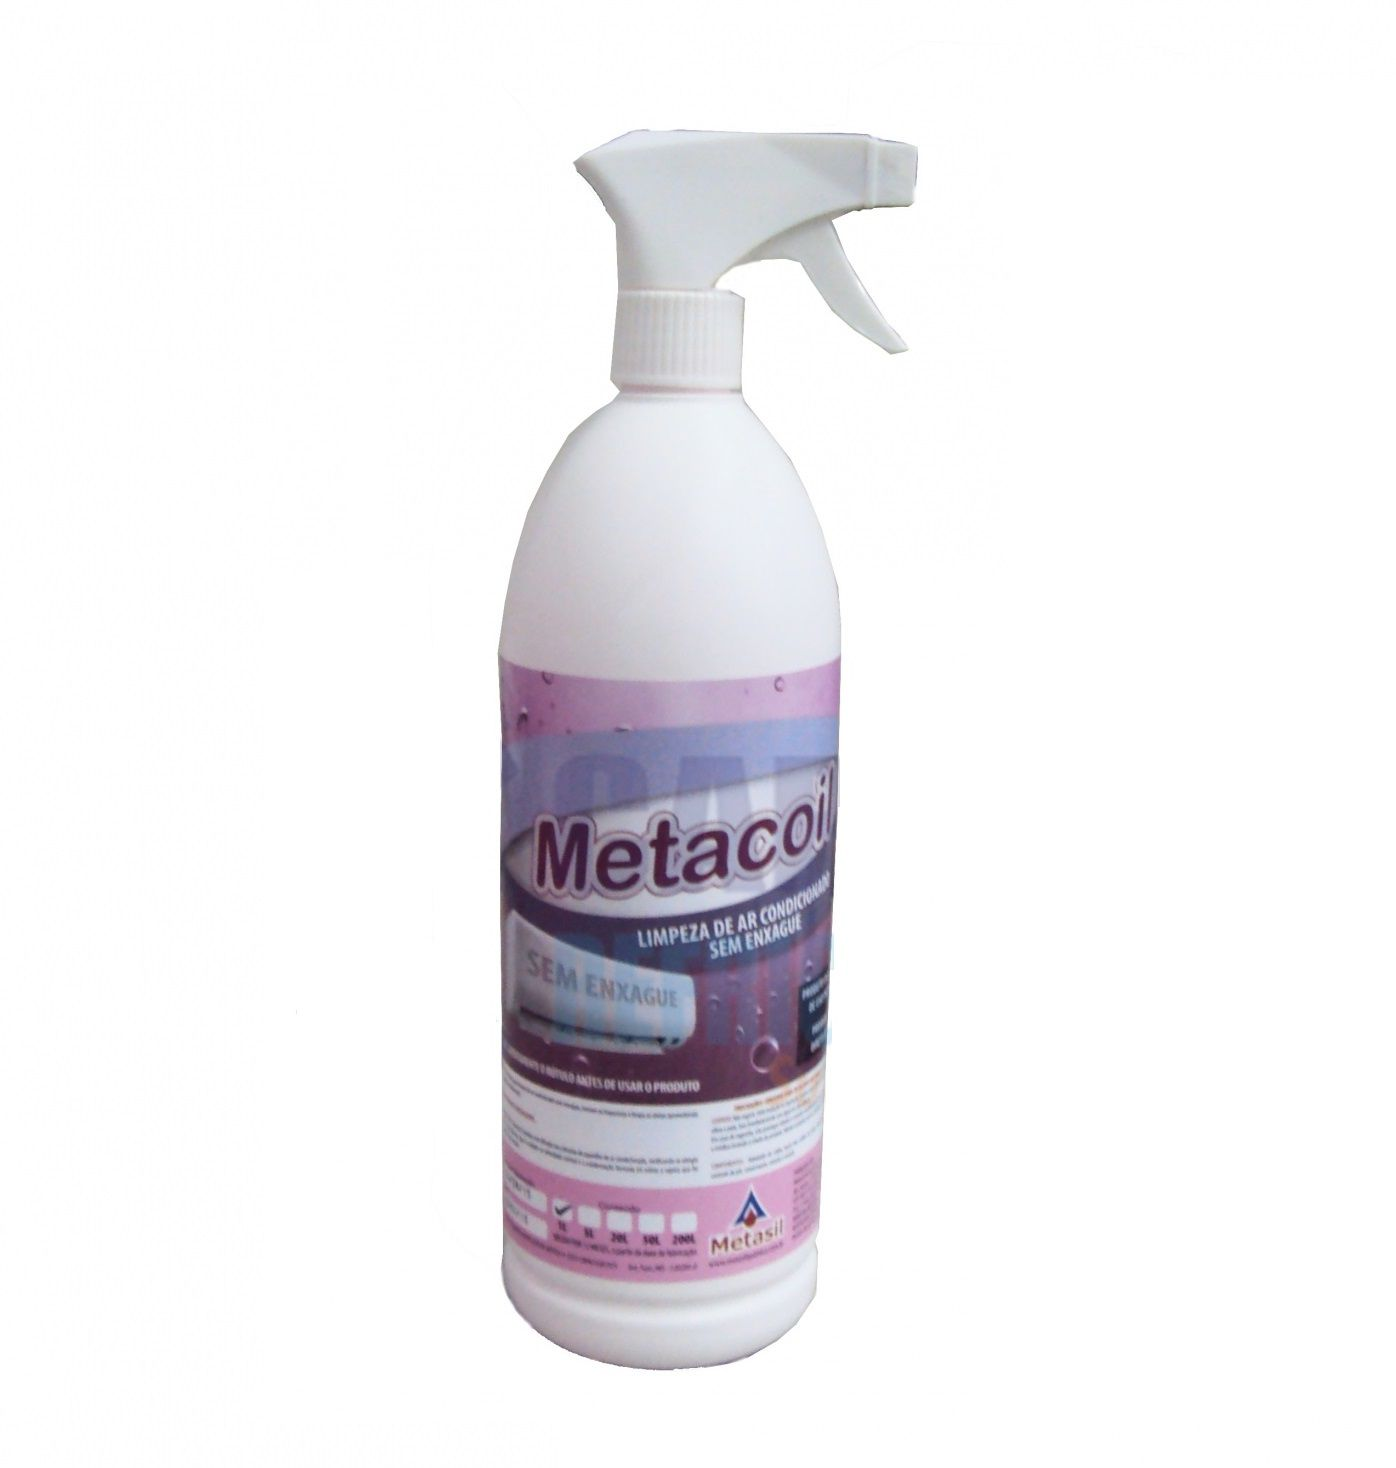 Metacoil Metasil 1L